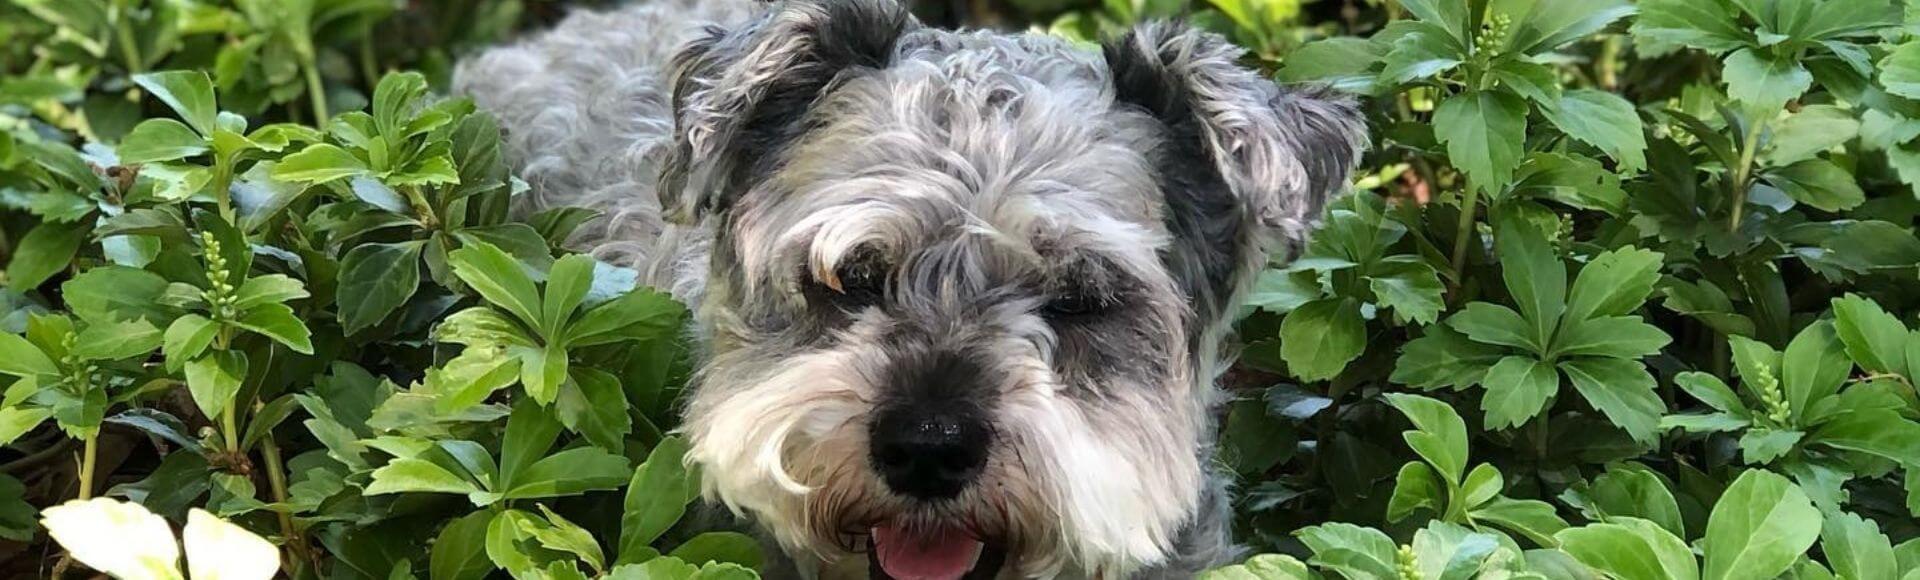 photo of cute dog